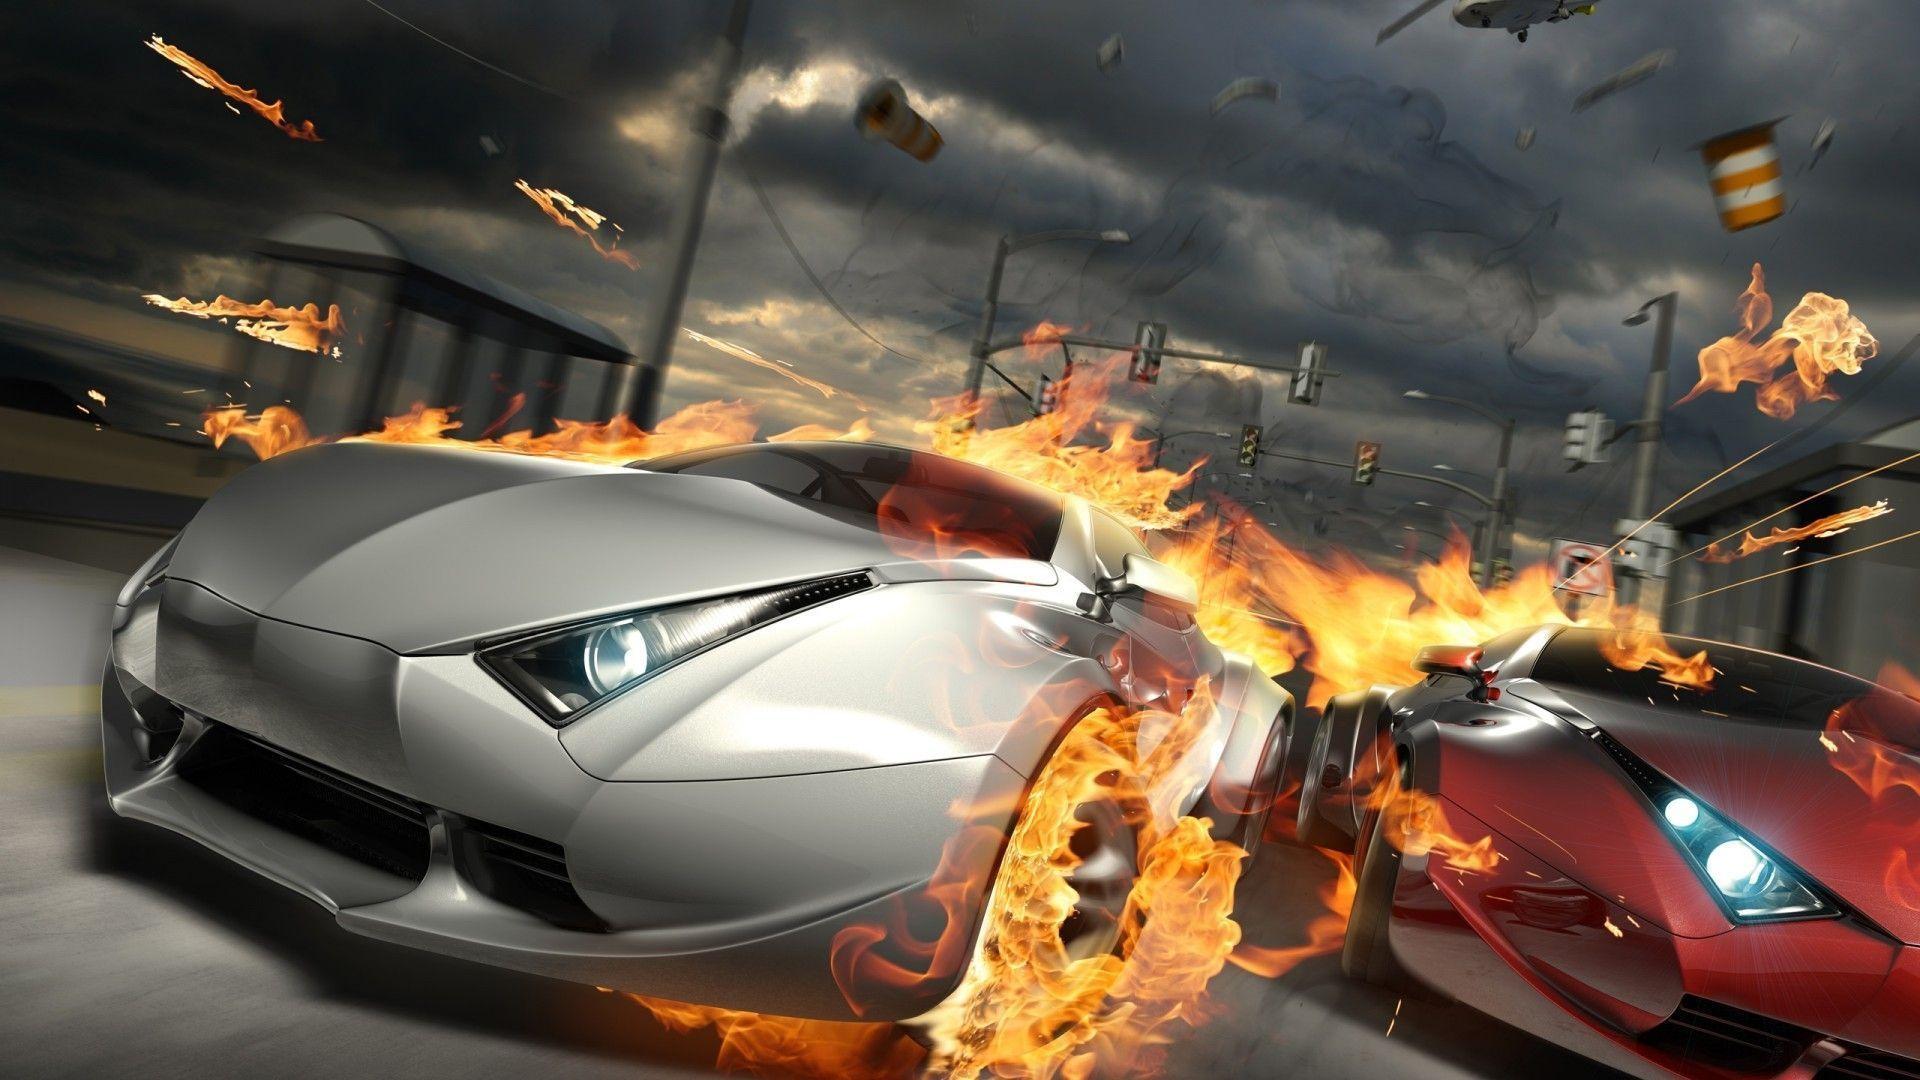 free pc wallpaper car hd download wallpapers hd 1080p